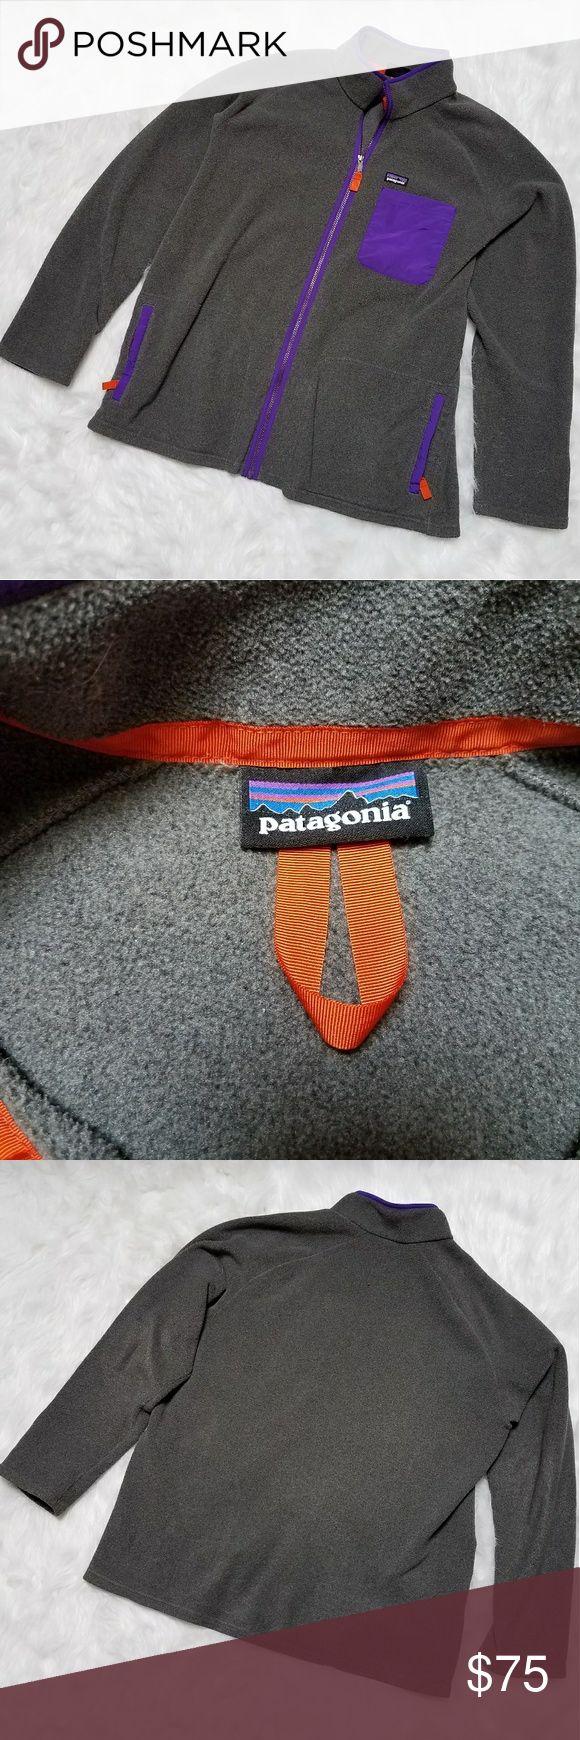 Men's Patagonia zip up fleece size XXL Men's Patagonia grey zip up fleece, size XXL size tag is missing, measurements pit to pit 28, purple and orange accents Patagonia Jackets & Coats Performance Jackets